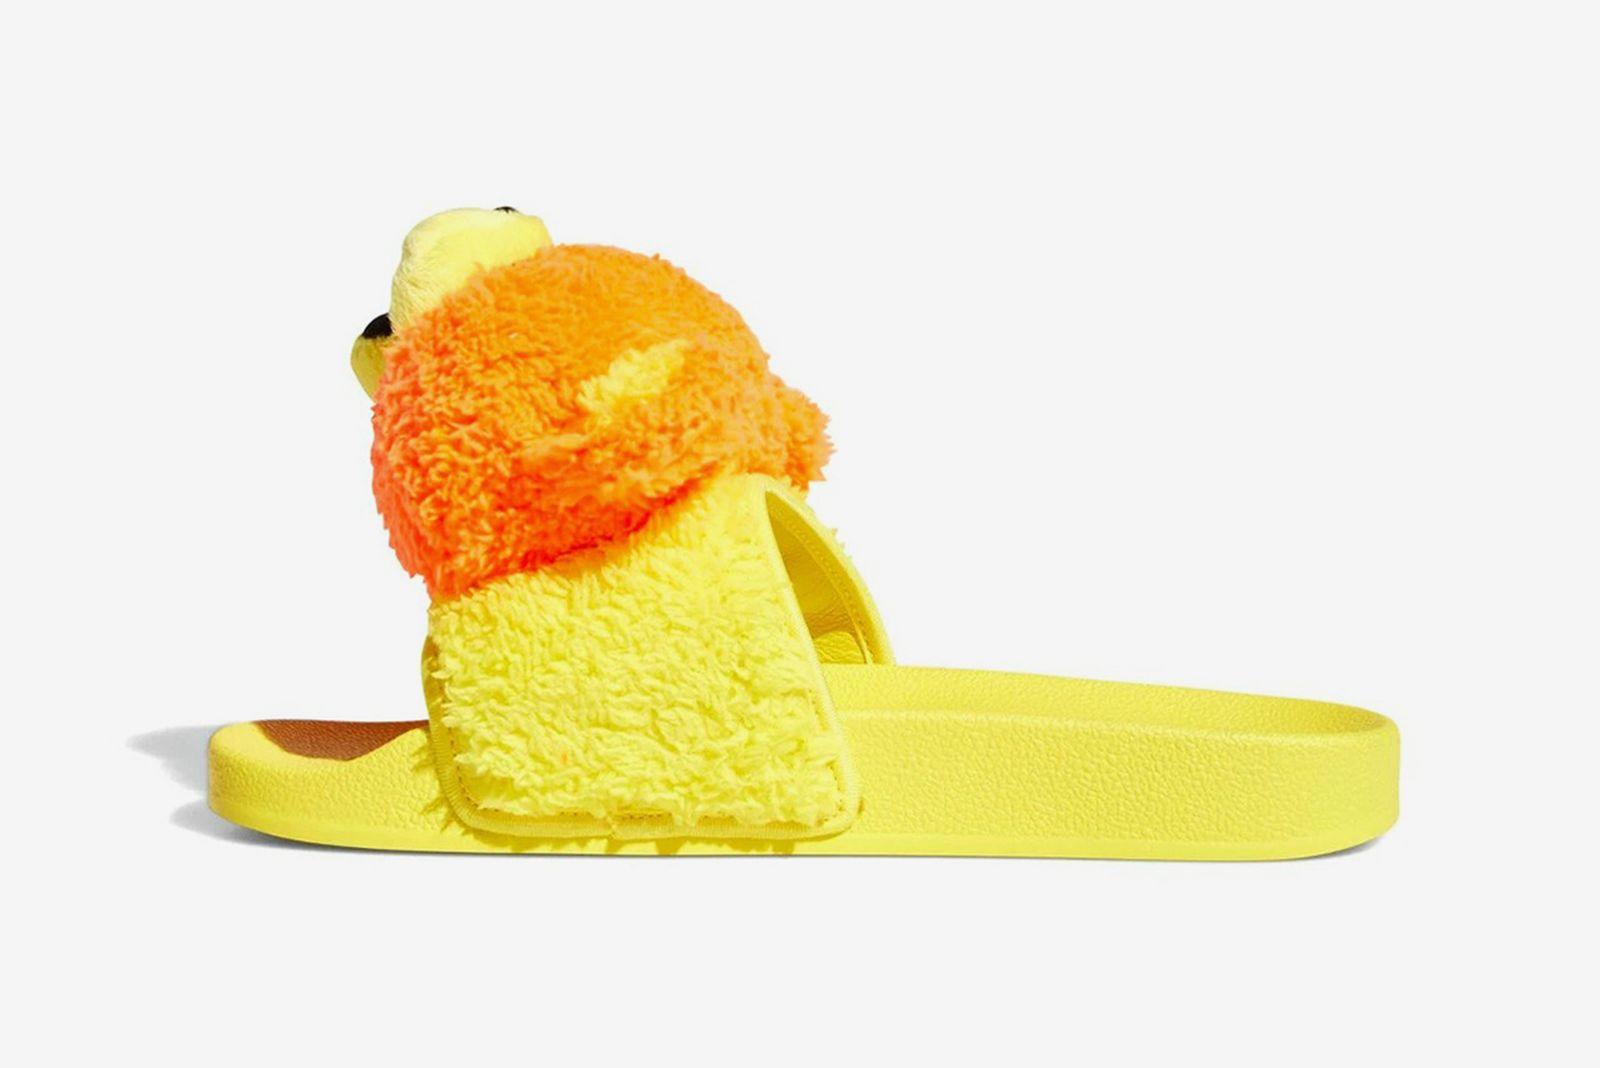 jeremy-scott-adidas-adilette-slides-js-bear-release-date-price-02